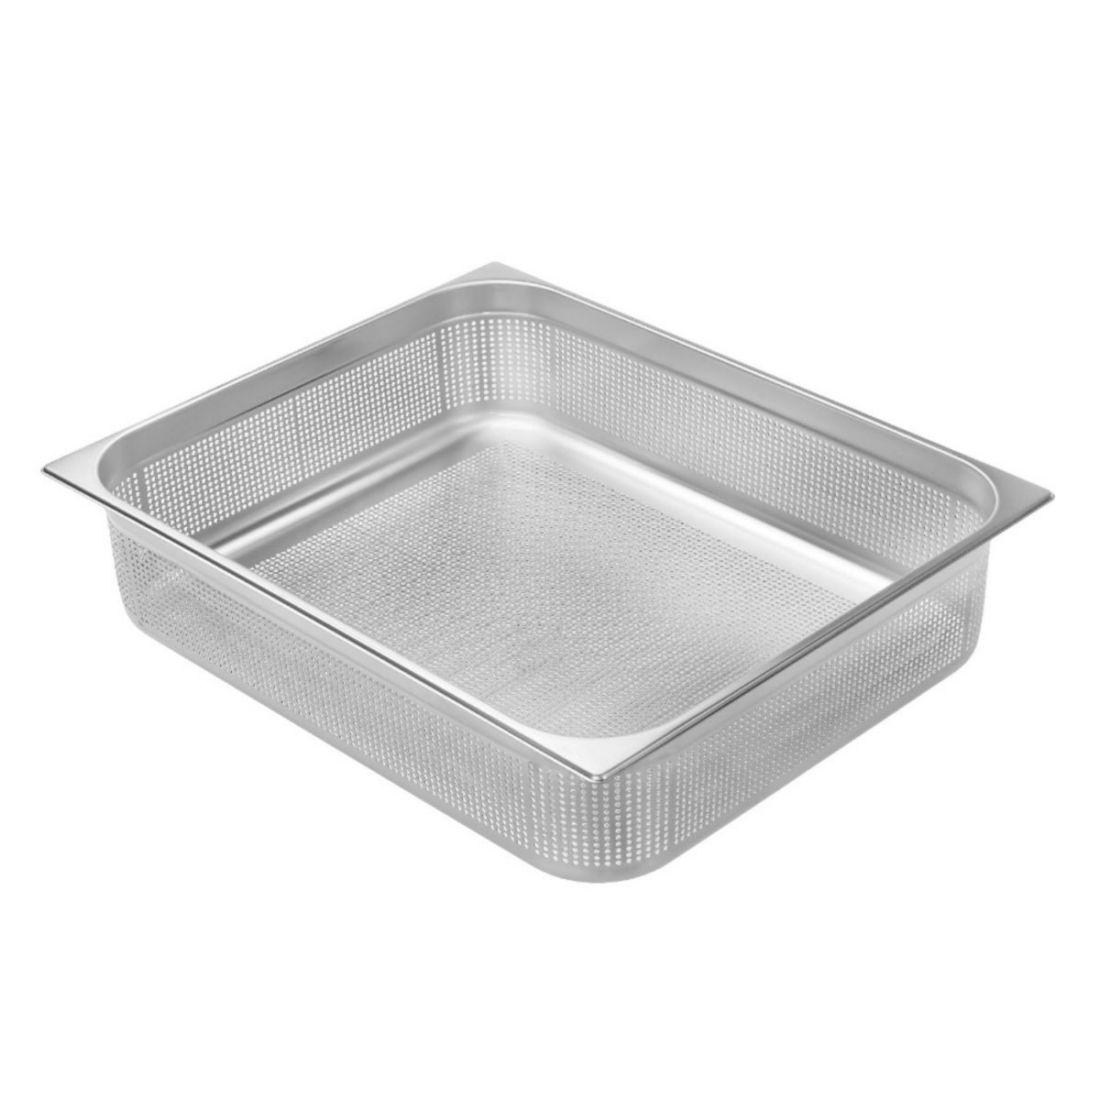 Gastronádoba Profi děrovaná GN 2/1 150 mm